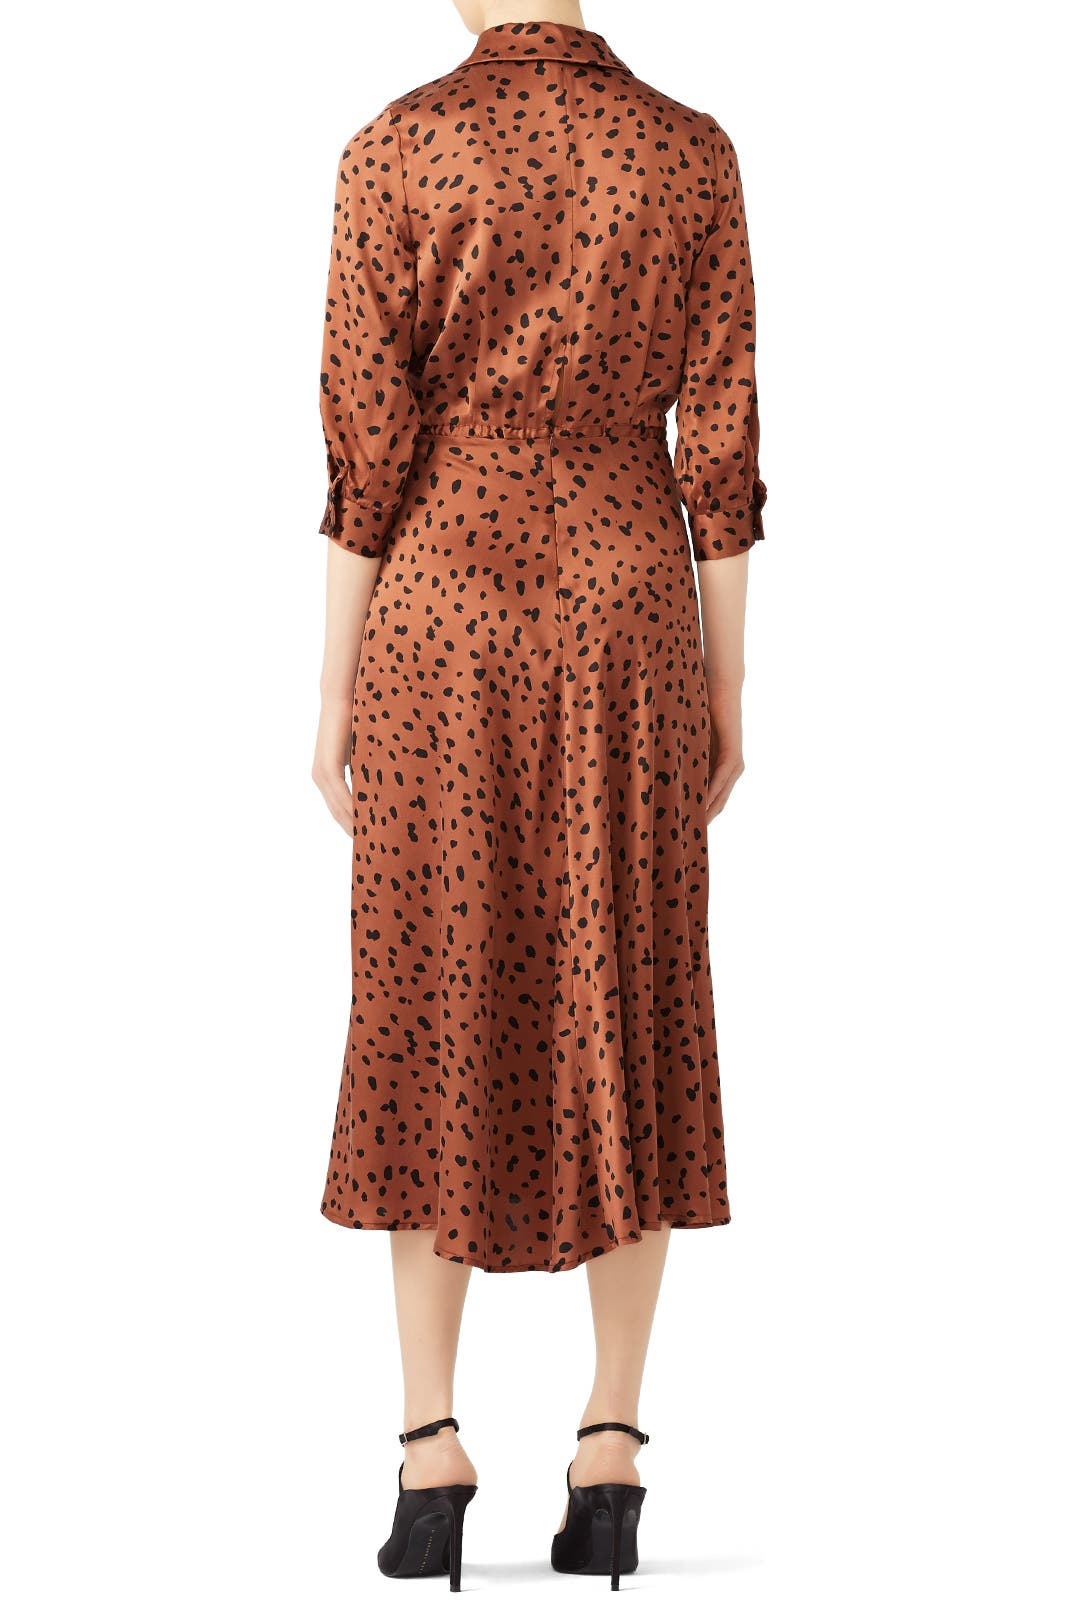 9725062636a8 Bec & Bridge Conga Beat Printed Silk Midi Dress Cheetah - Summer -Womens  Clothing .